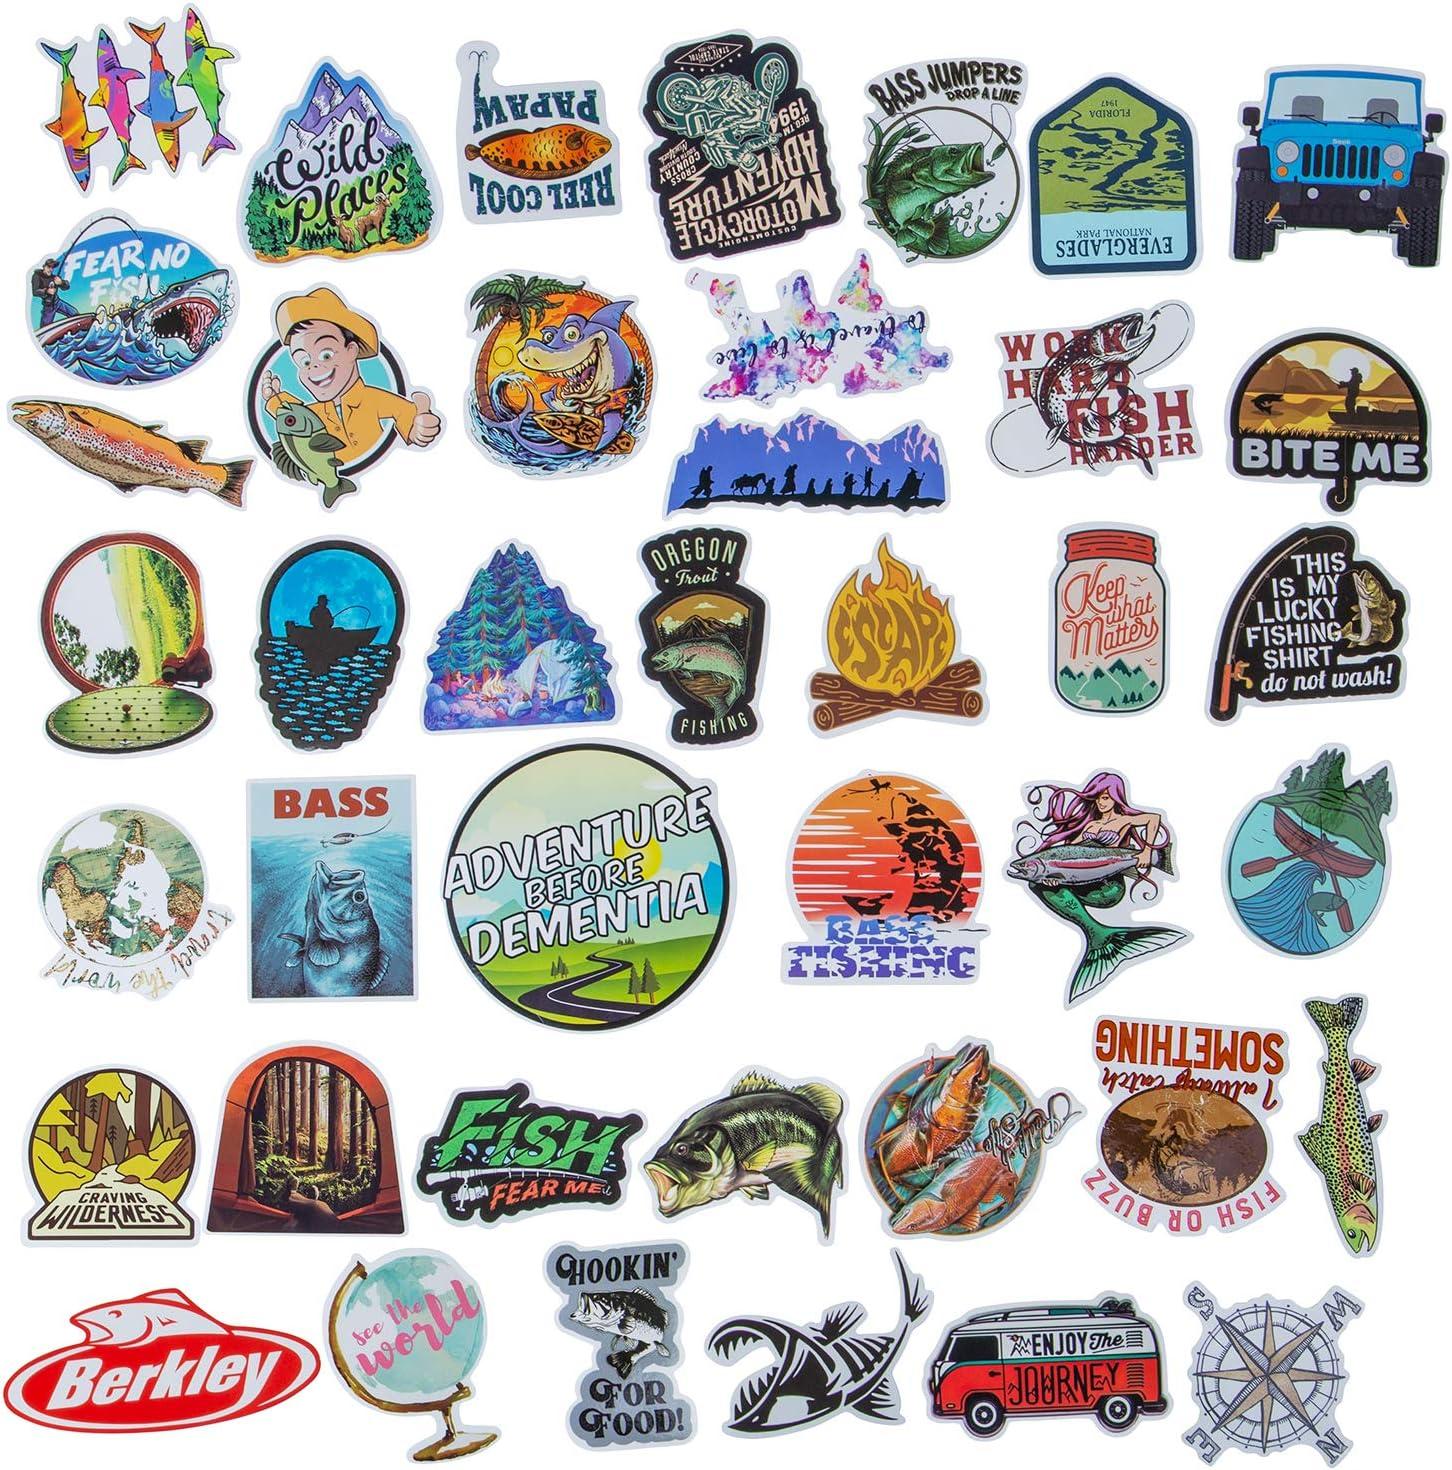 Tim Burton Stickers Waterproof Vinyl Stickers Skateboard Laptop Stickers 60PCS Halloween Stickers for Teens Tim Burton Gifts for Kids Halloween Party Favor Supplies Guitar Luggage Graffiti Decals